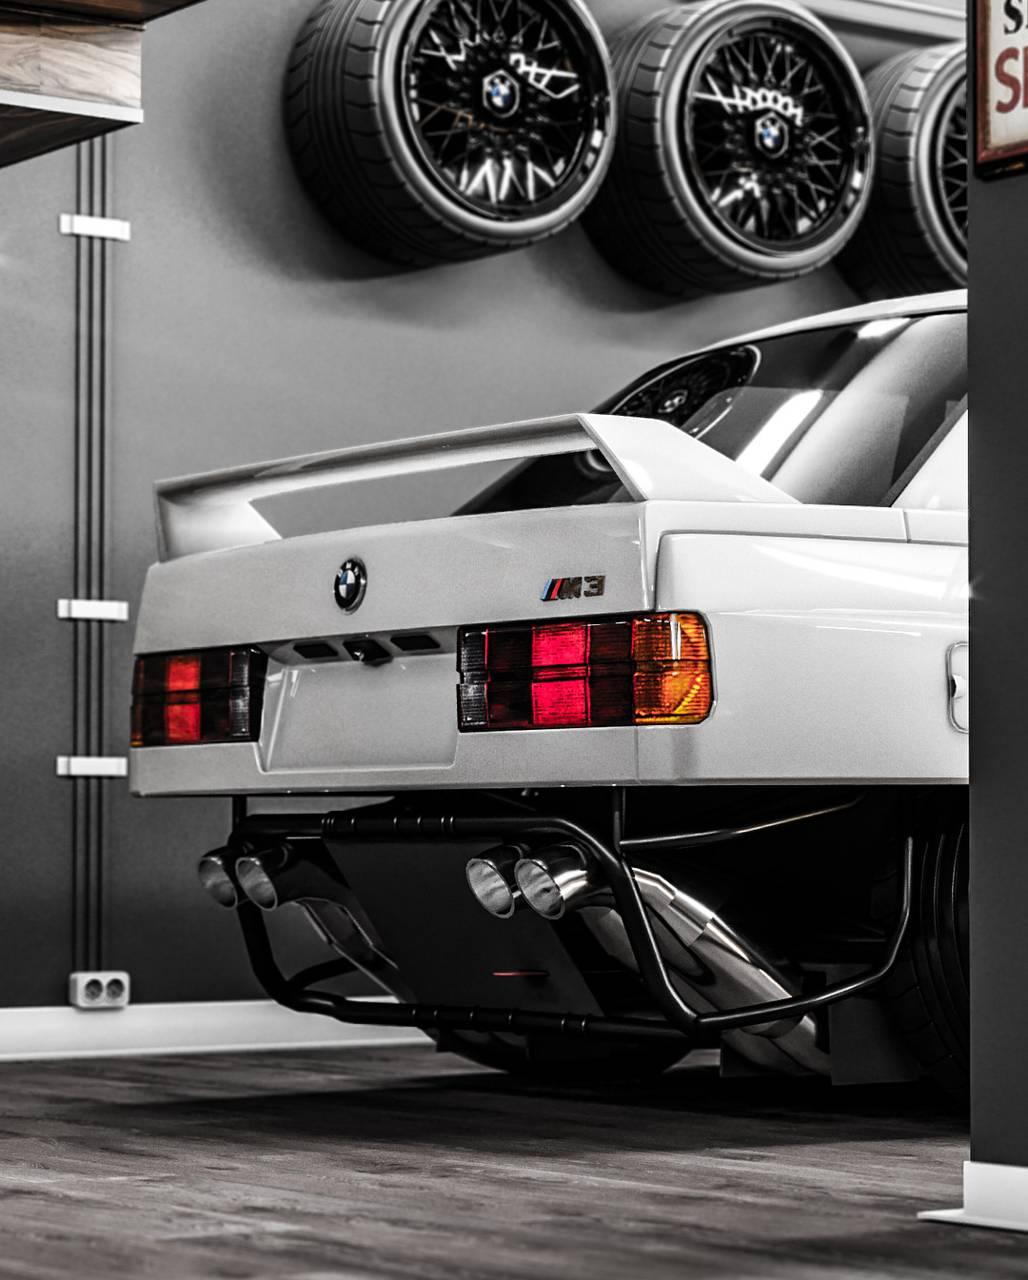 BMWe30 M3